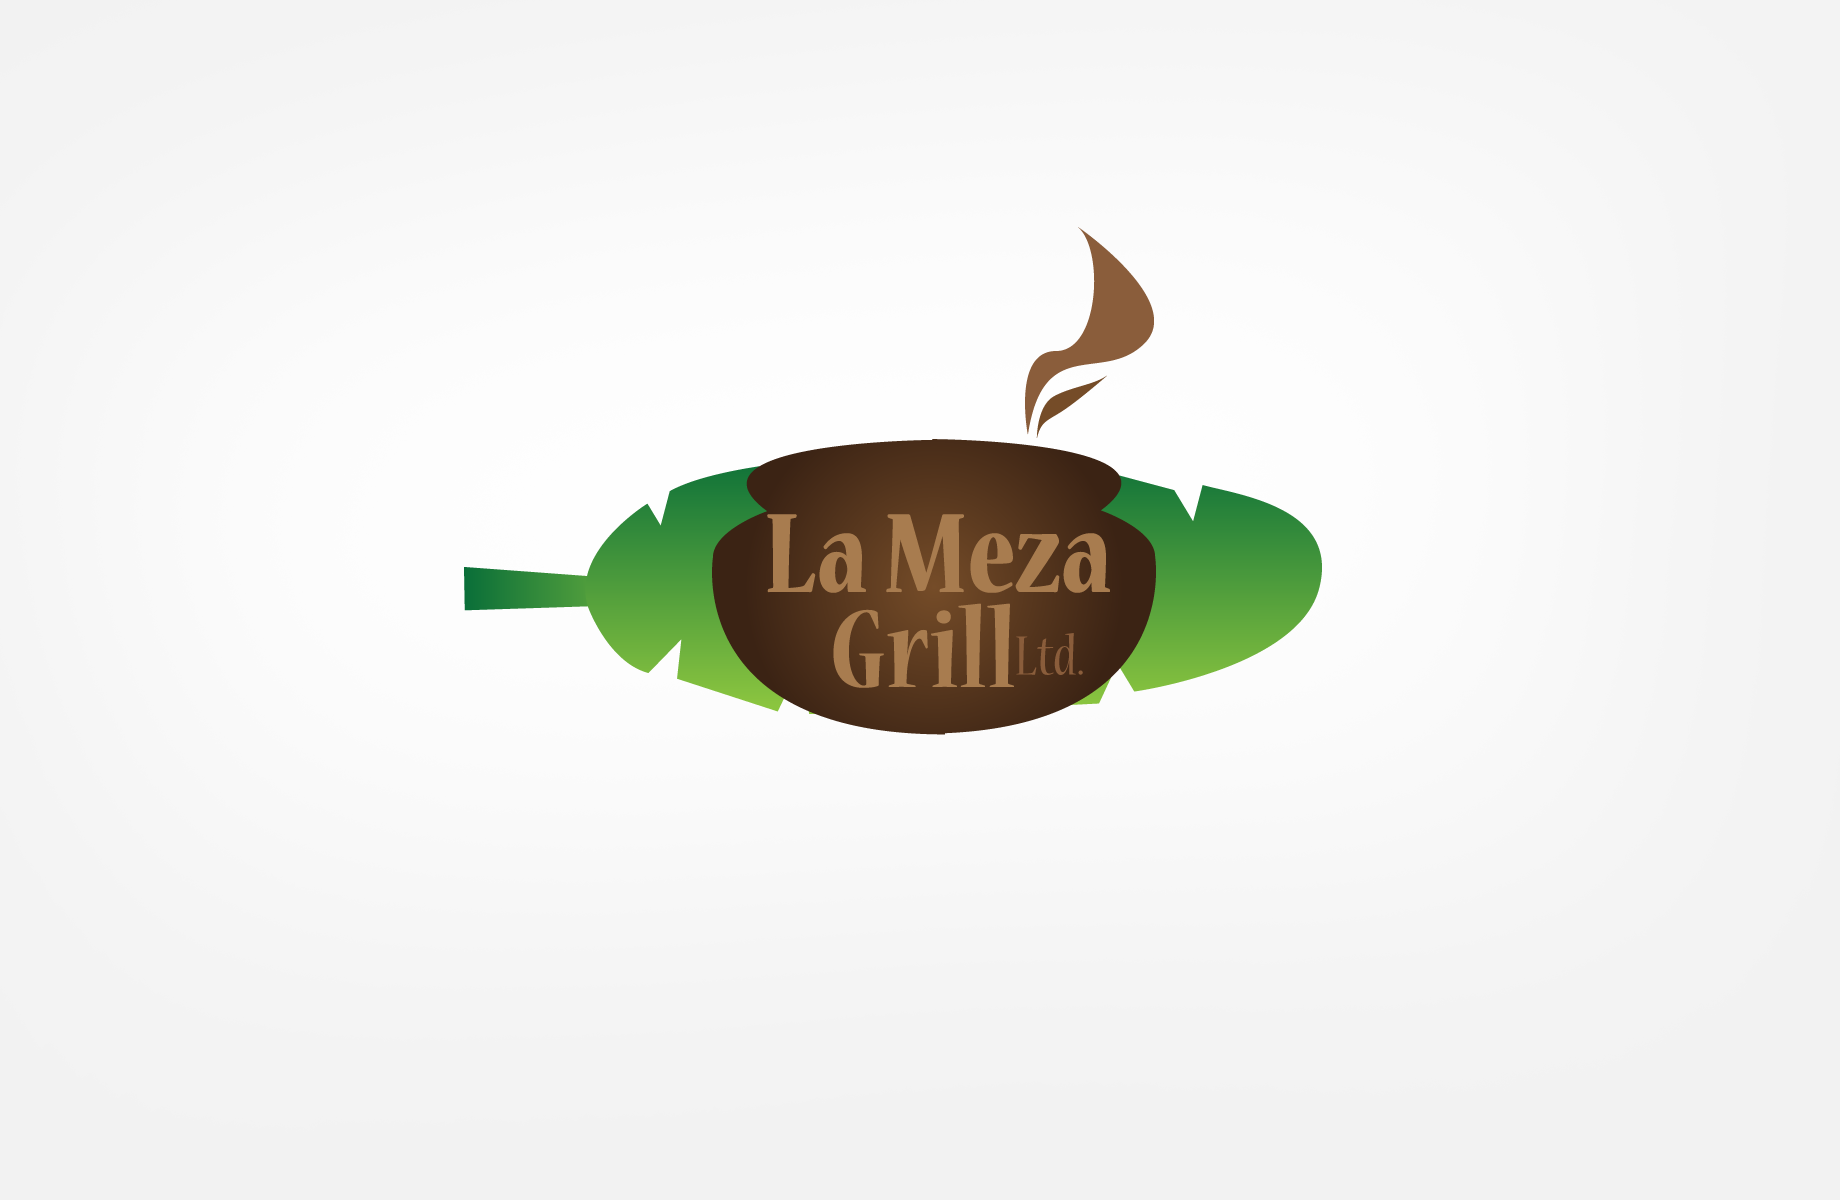 Logo Design by Jan Chua - Entry No. 45 in the Logo Design Contest Inspiring Logo Design for La Meza Grill Ltd..